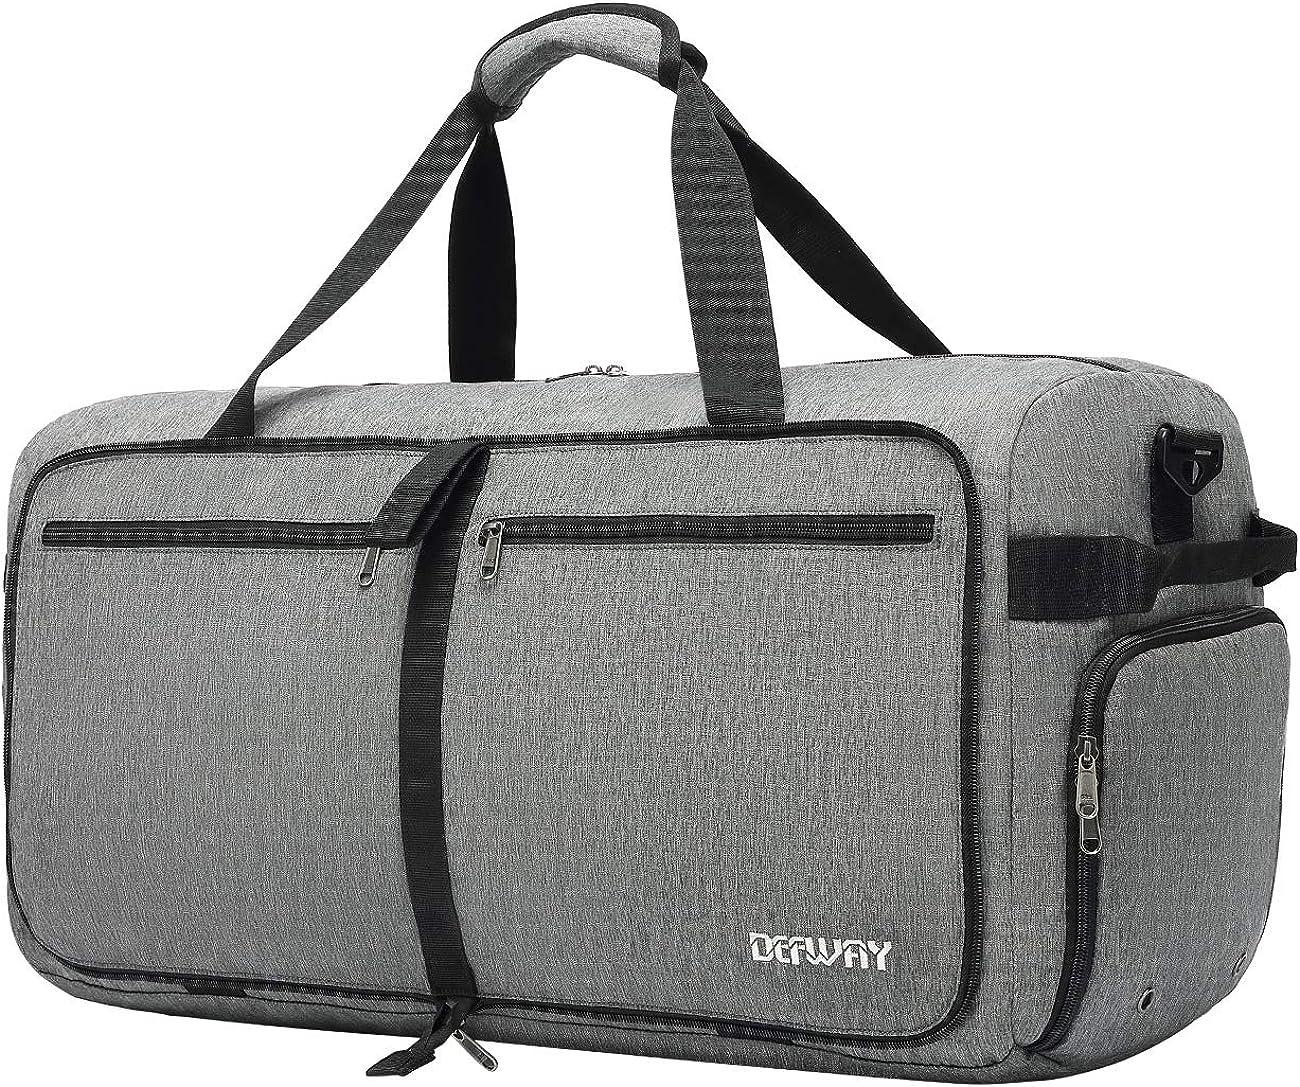 Defway 65L Travel Duffle Bag, Foldable Weekender Bag Lightweight Large Overnight Duffel Water Tear Resistant